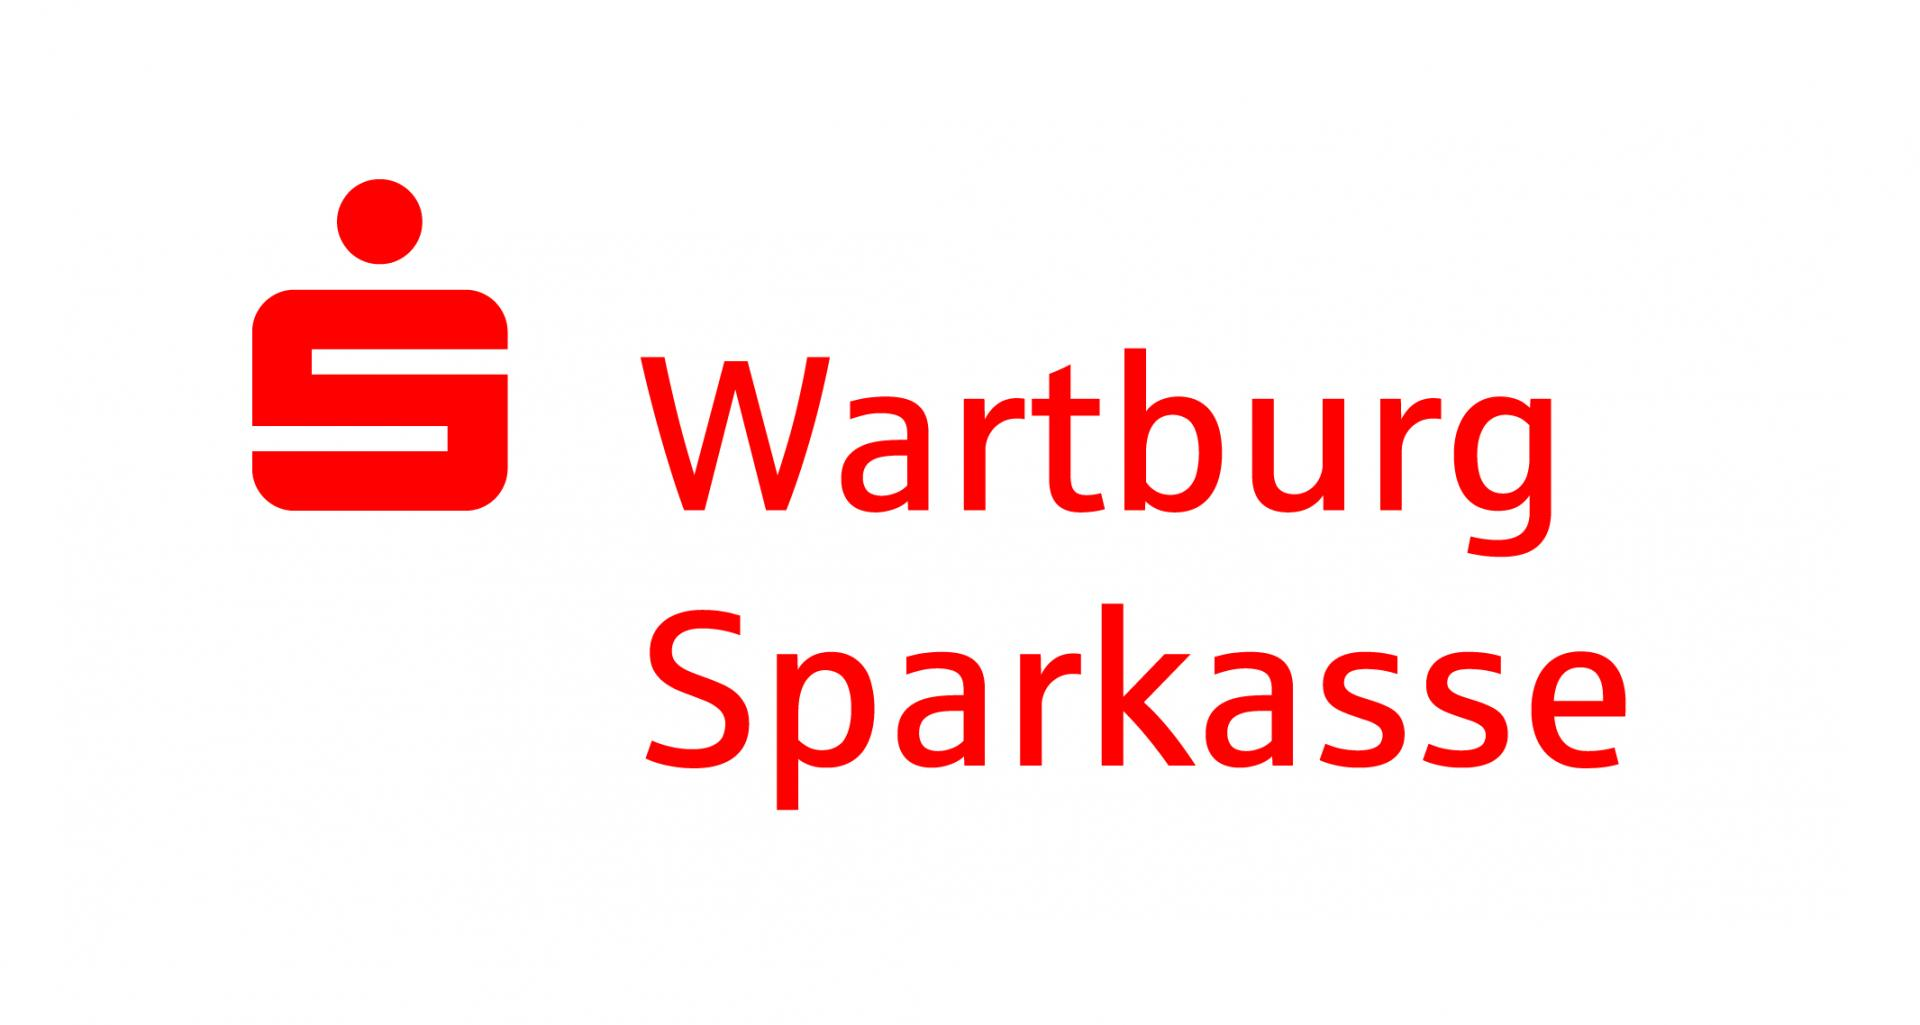 Wartburgsparkasse